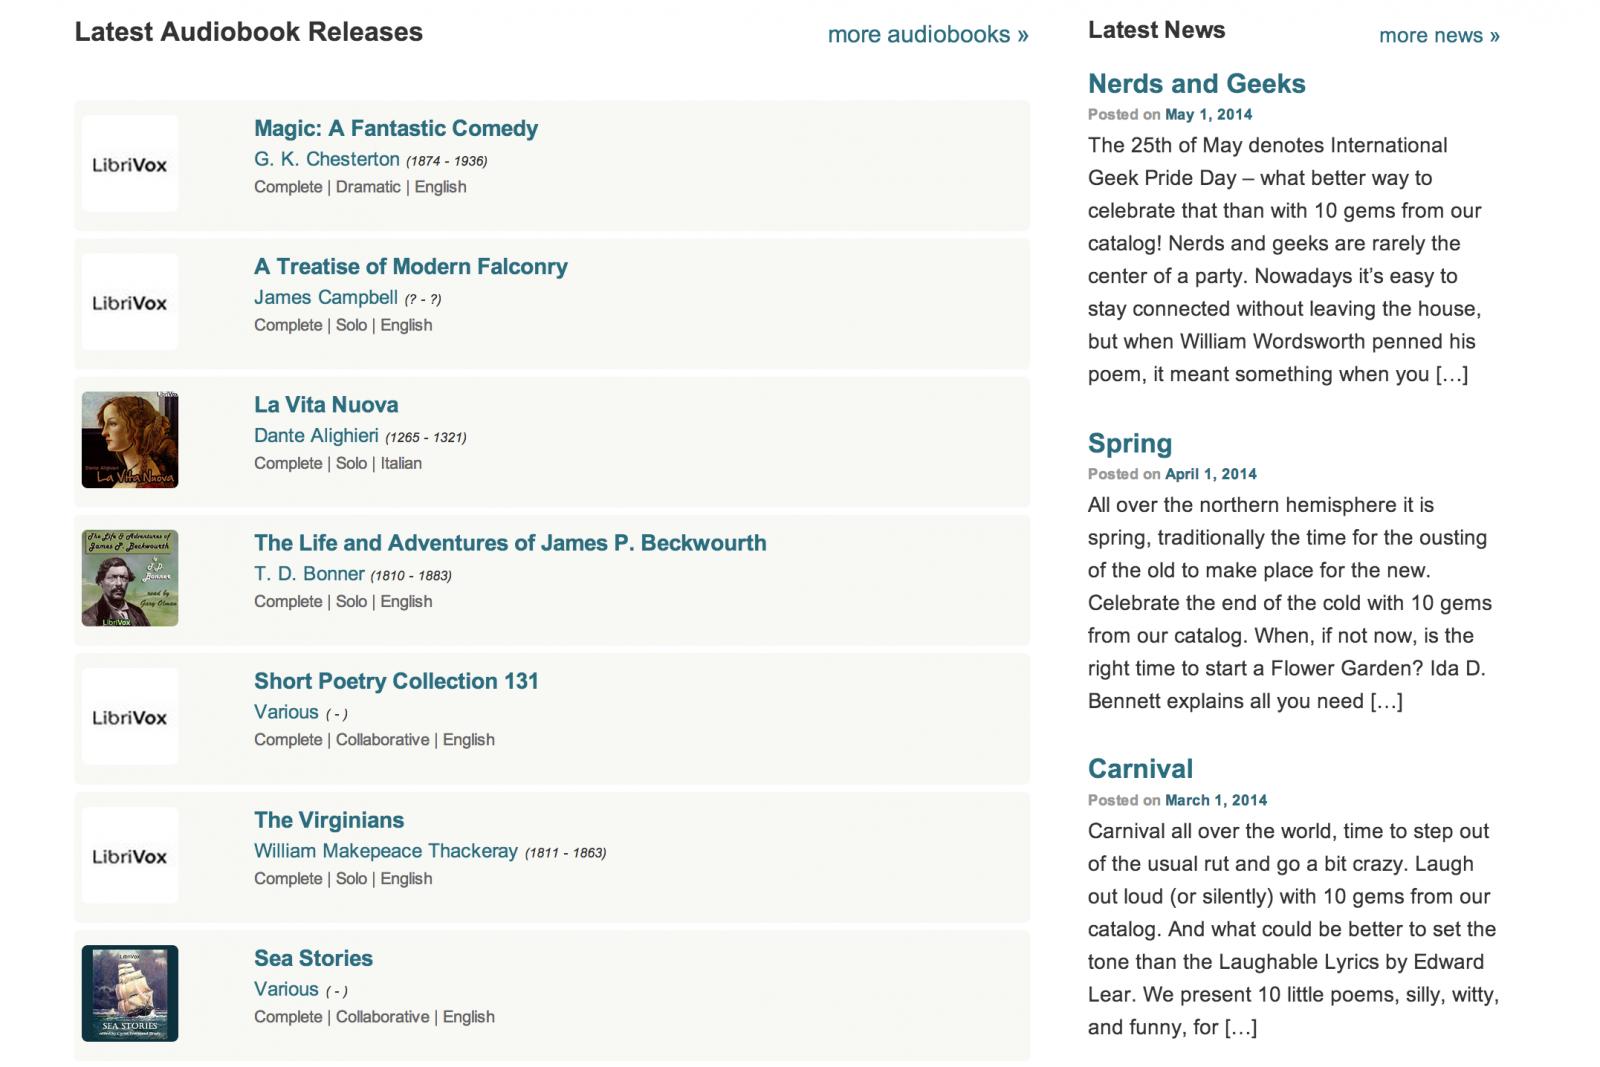 LibriVox site detail